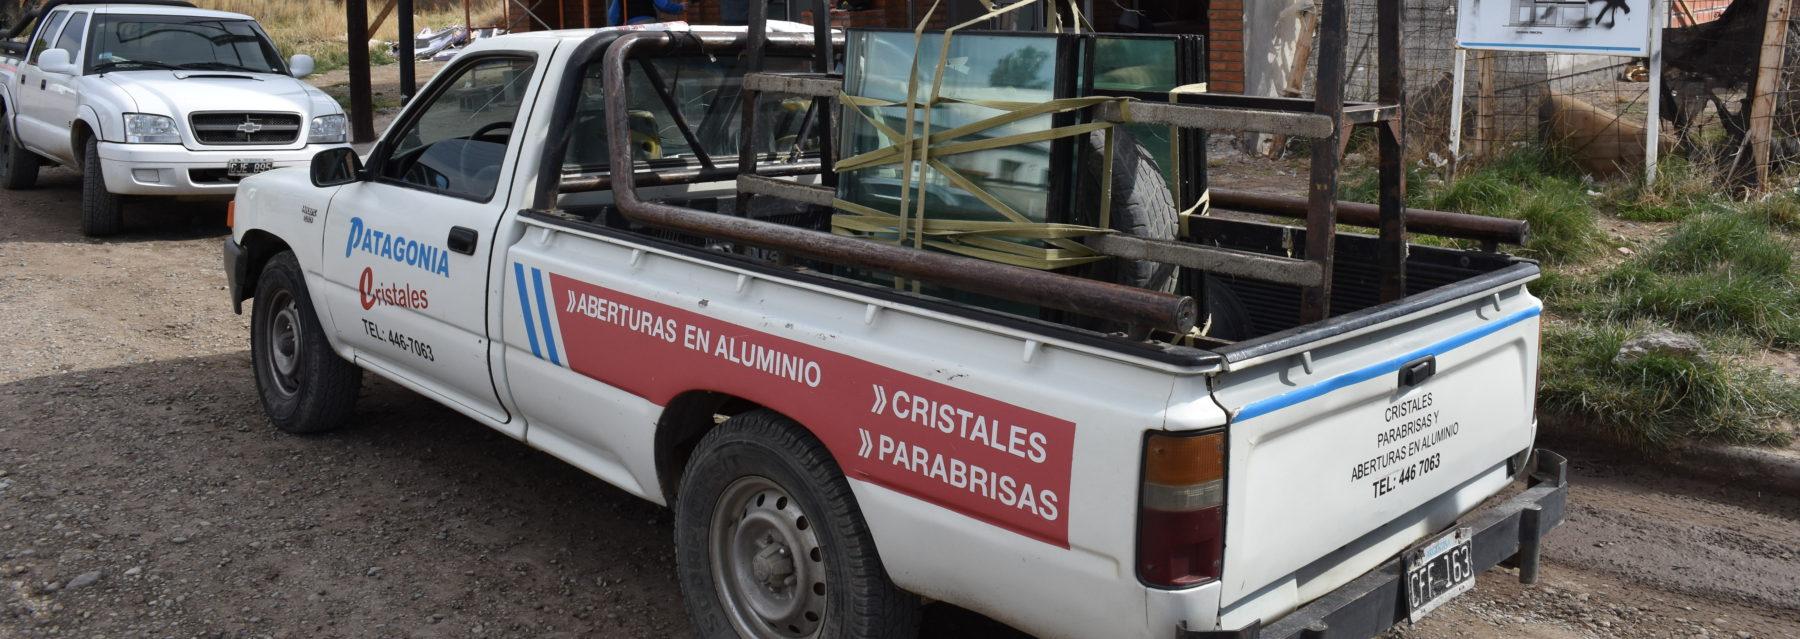 Patagonia Cristales